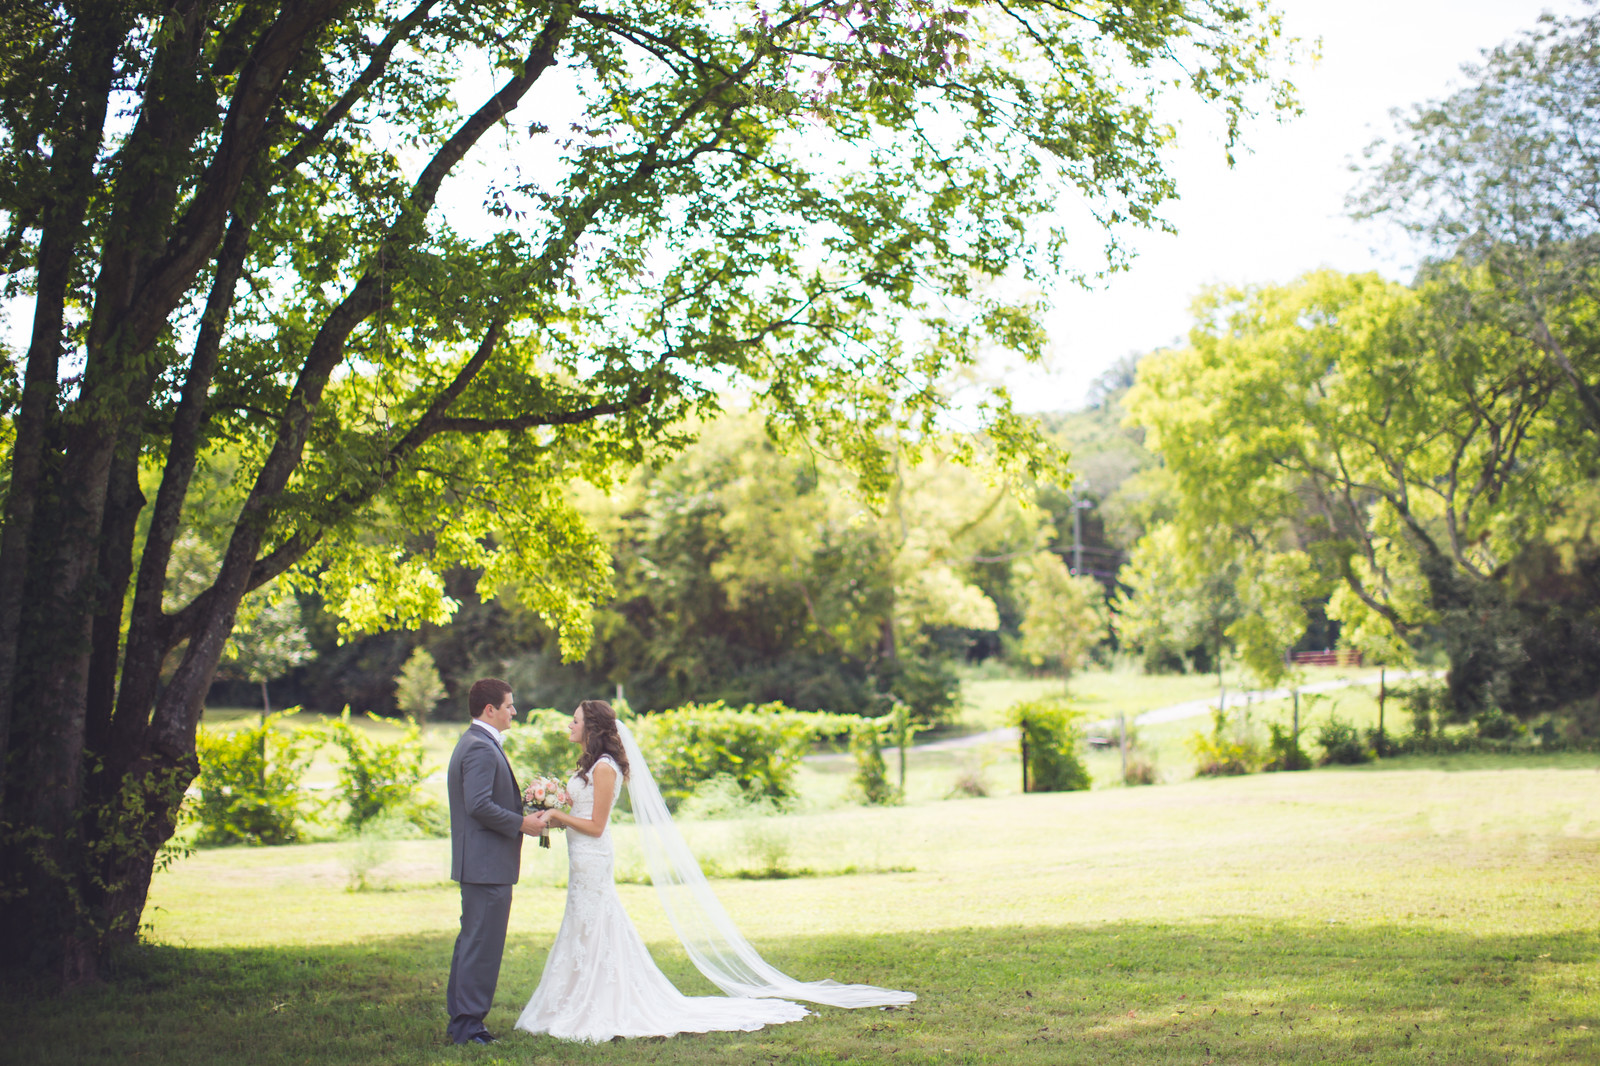 286_Harrison+Merritt_Wedding-X3.jpg